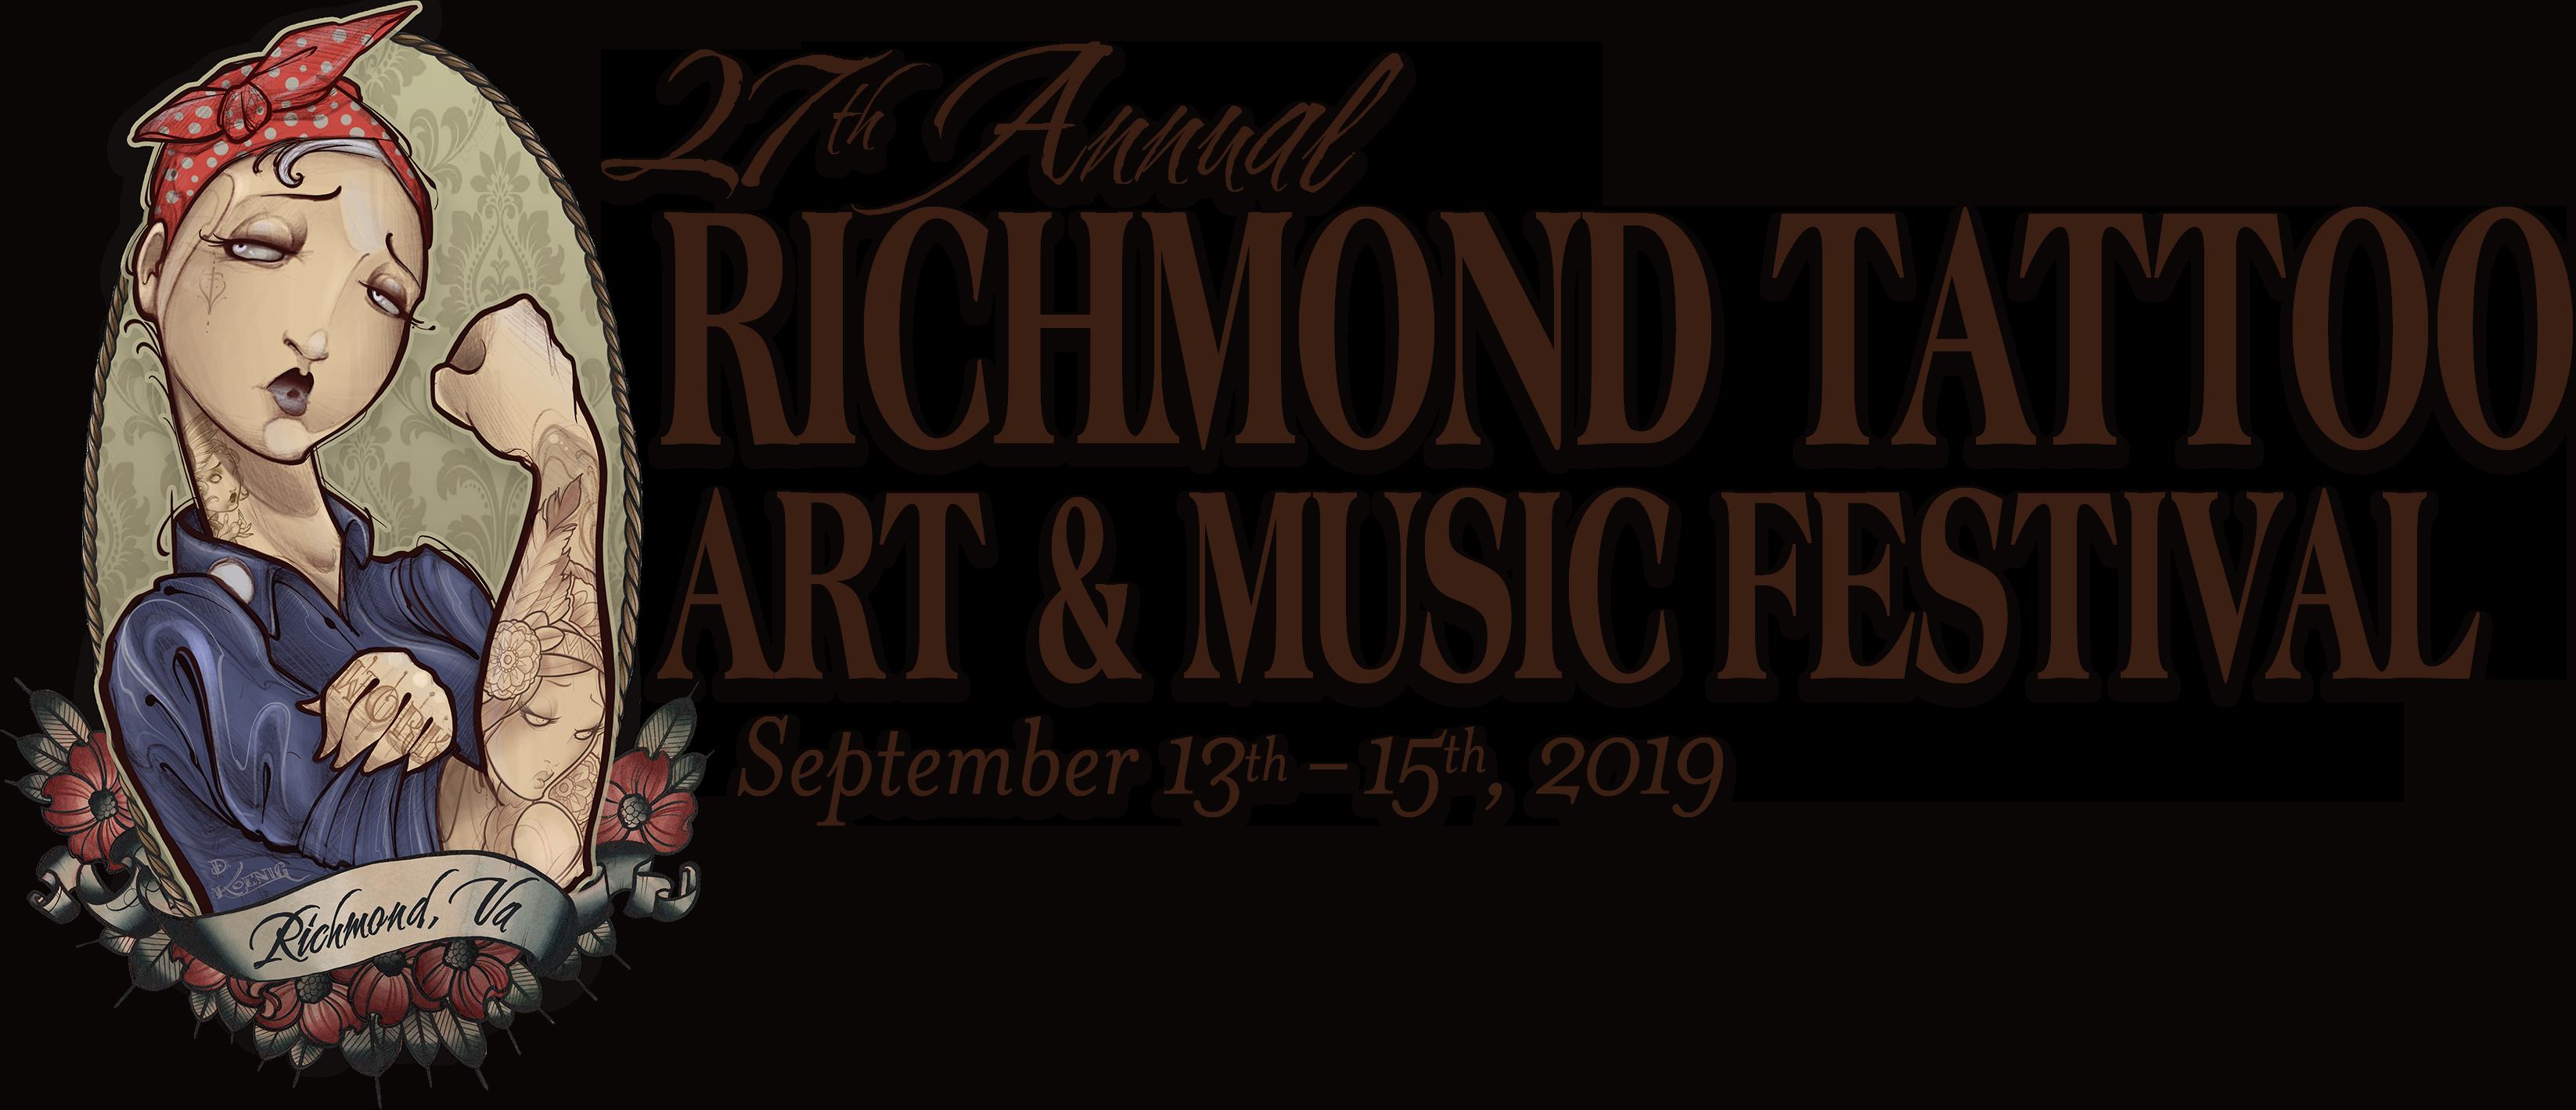 Richmond Tattoo Art & Music Festival logo